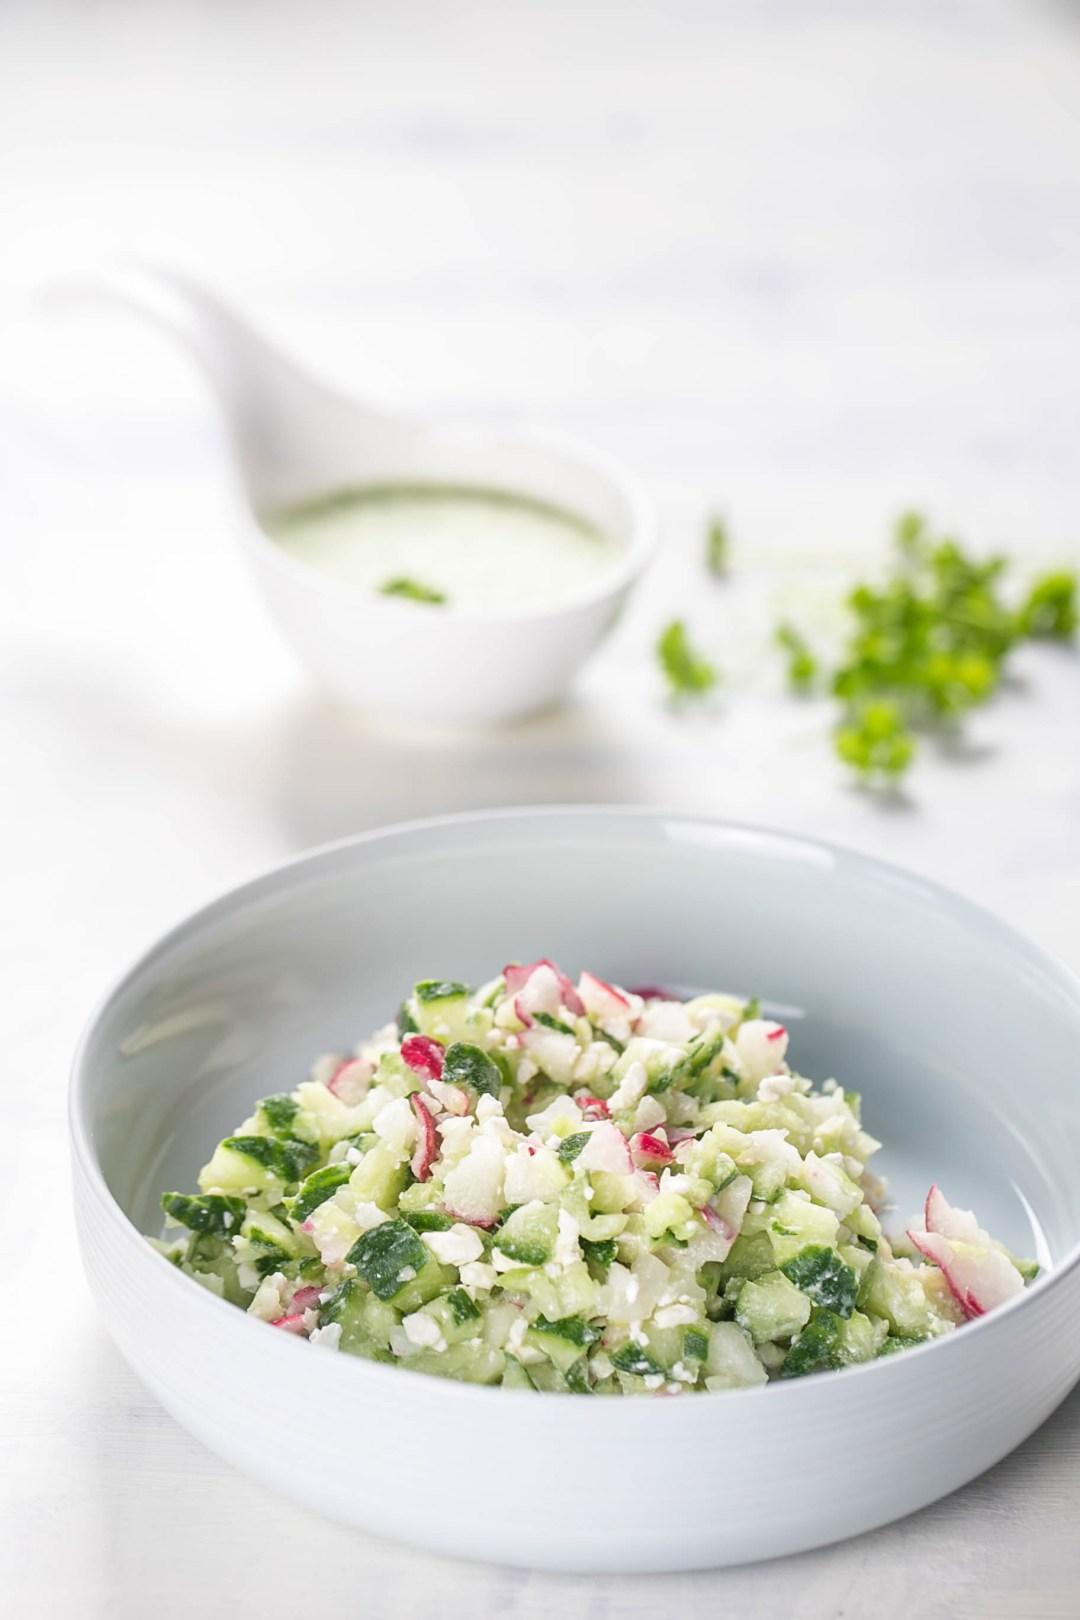 Gurkensalat aus dem Thermomix®